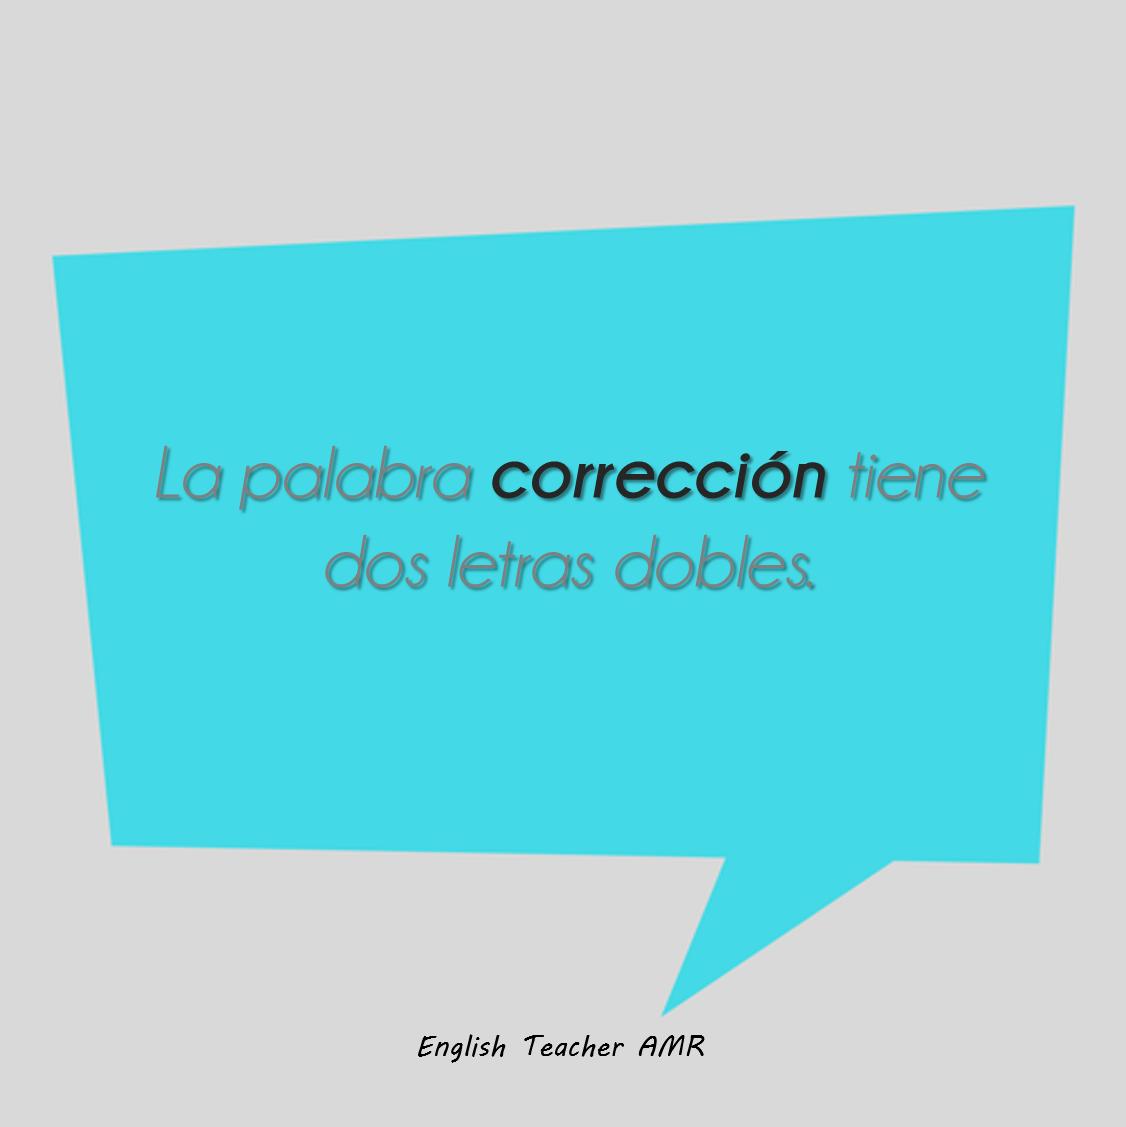 Curiosidades Del Idioma Espanol Englishteacheramr